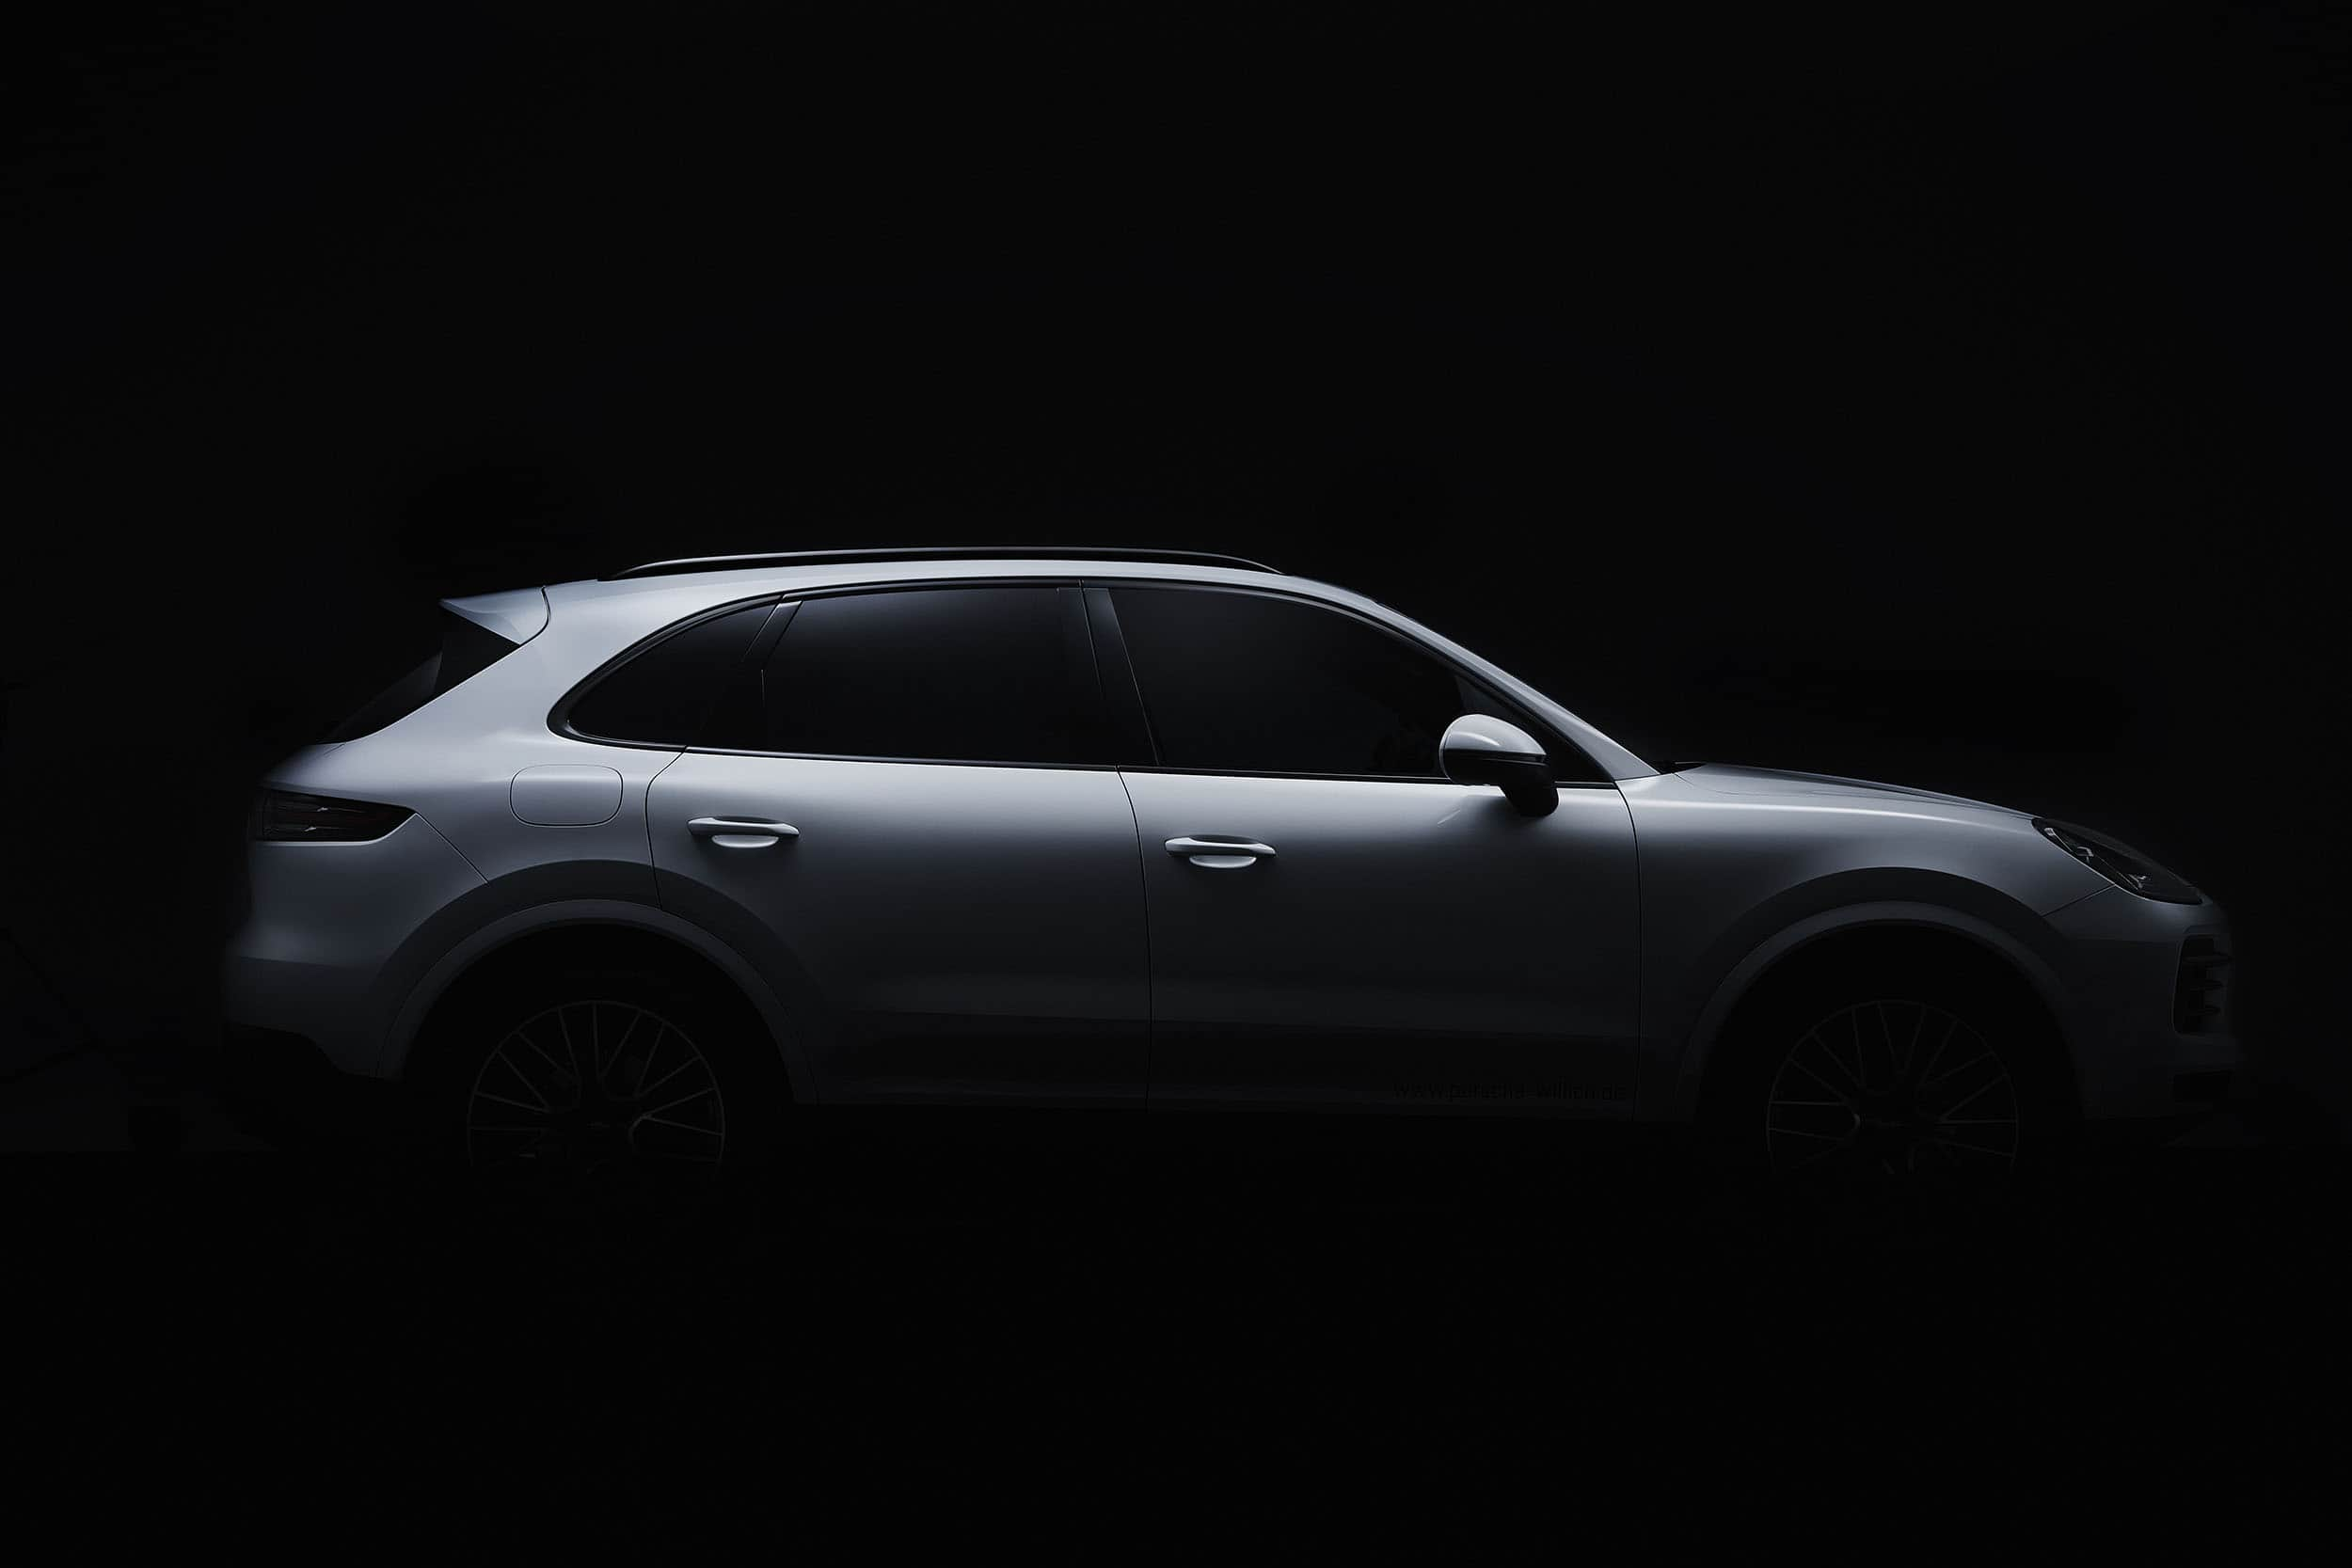 studio-ignatov-wkw-automotive-imagekampagne-bw-04